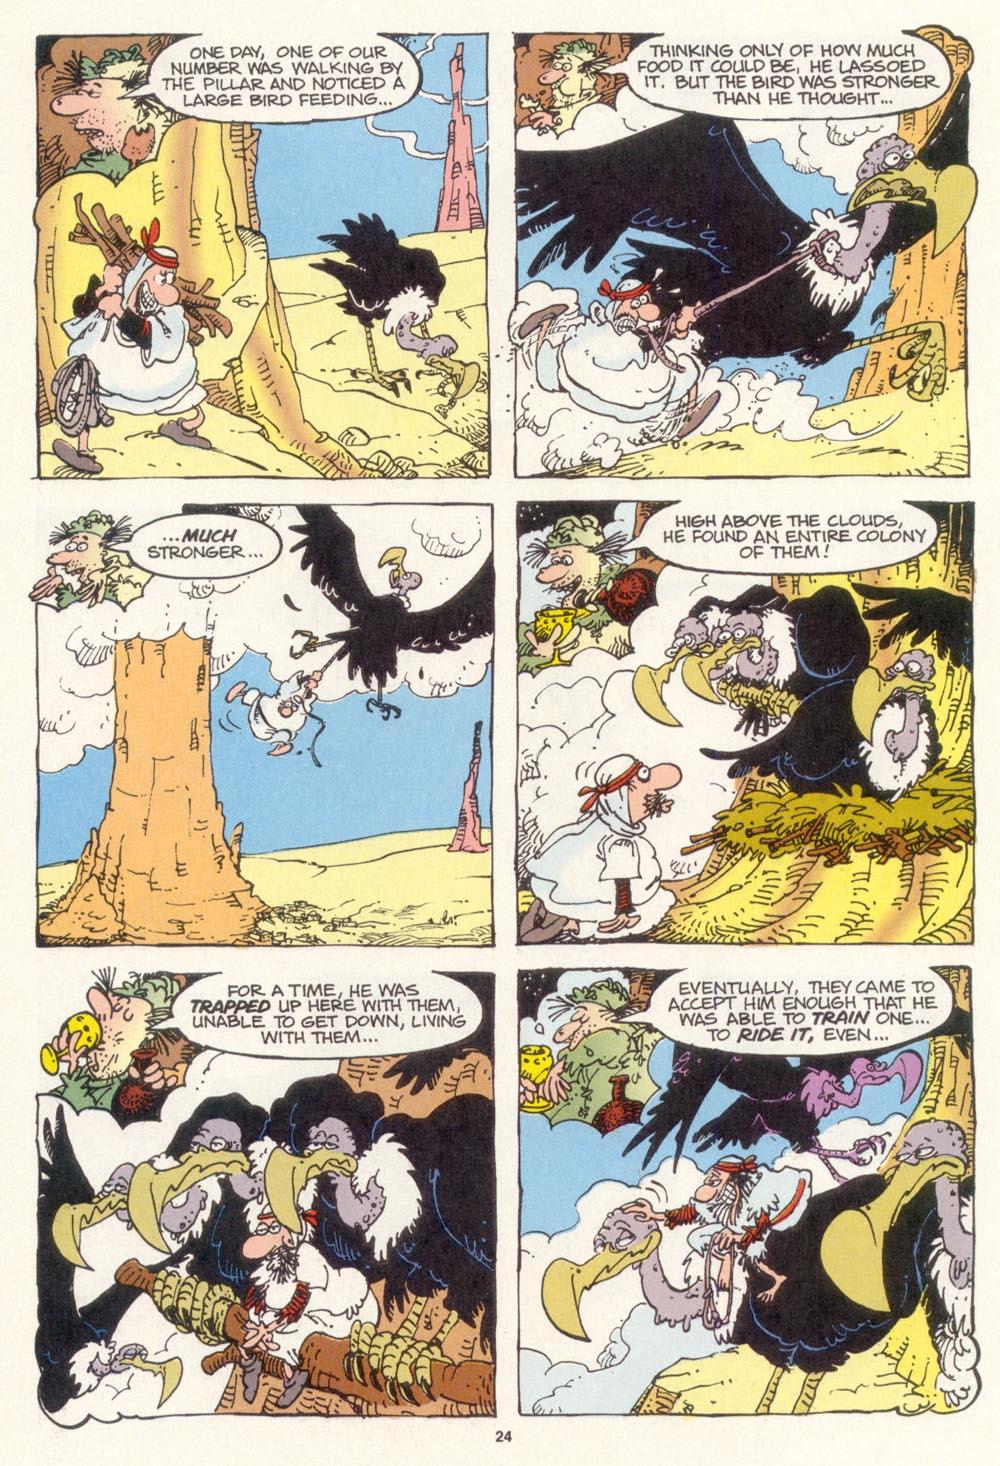 Read online Sergio Aragonés Groo the Wanderer comic -  Issue #114 - 26